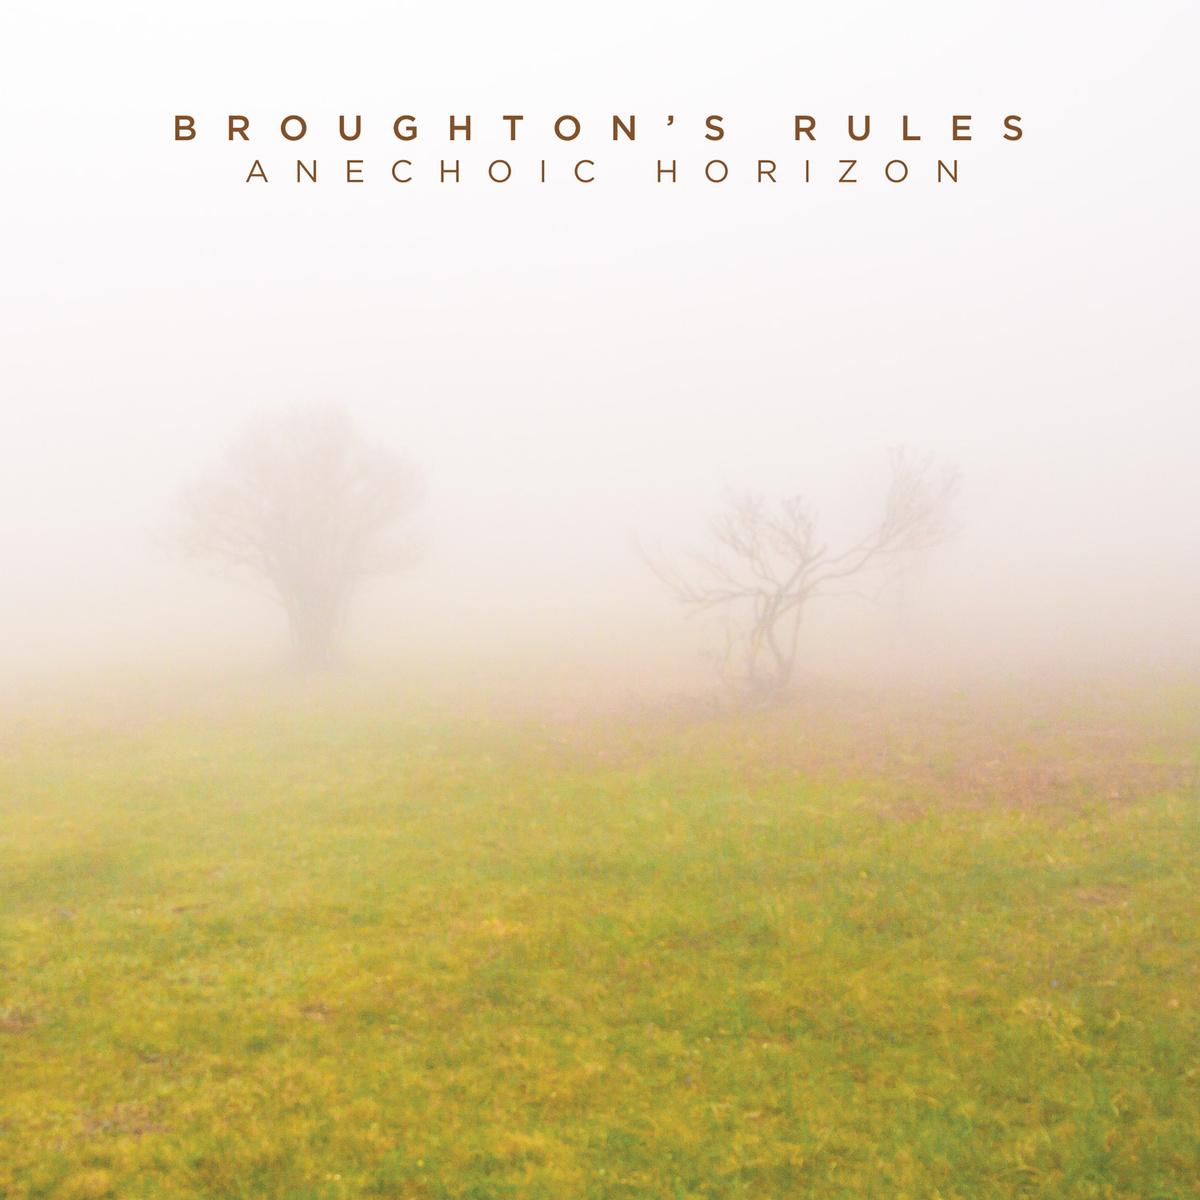 Broughton's Rules ANECHOIC HORIZONS